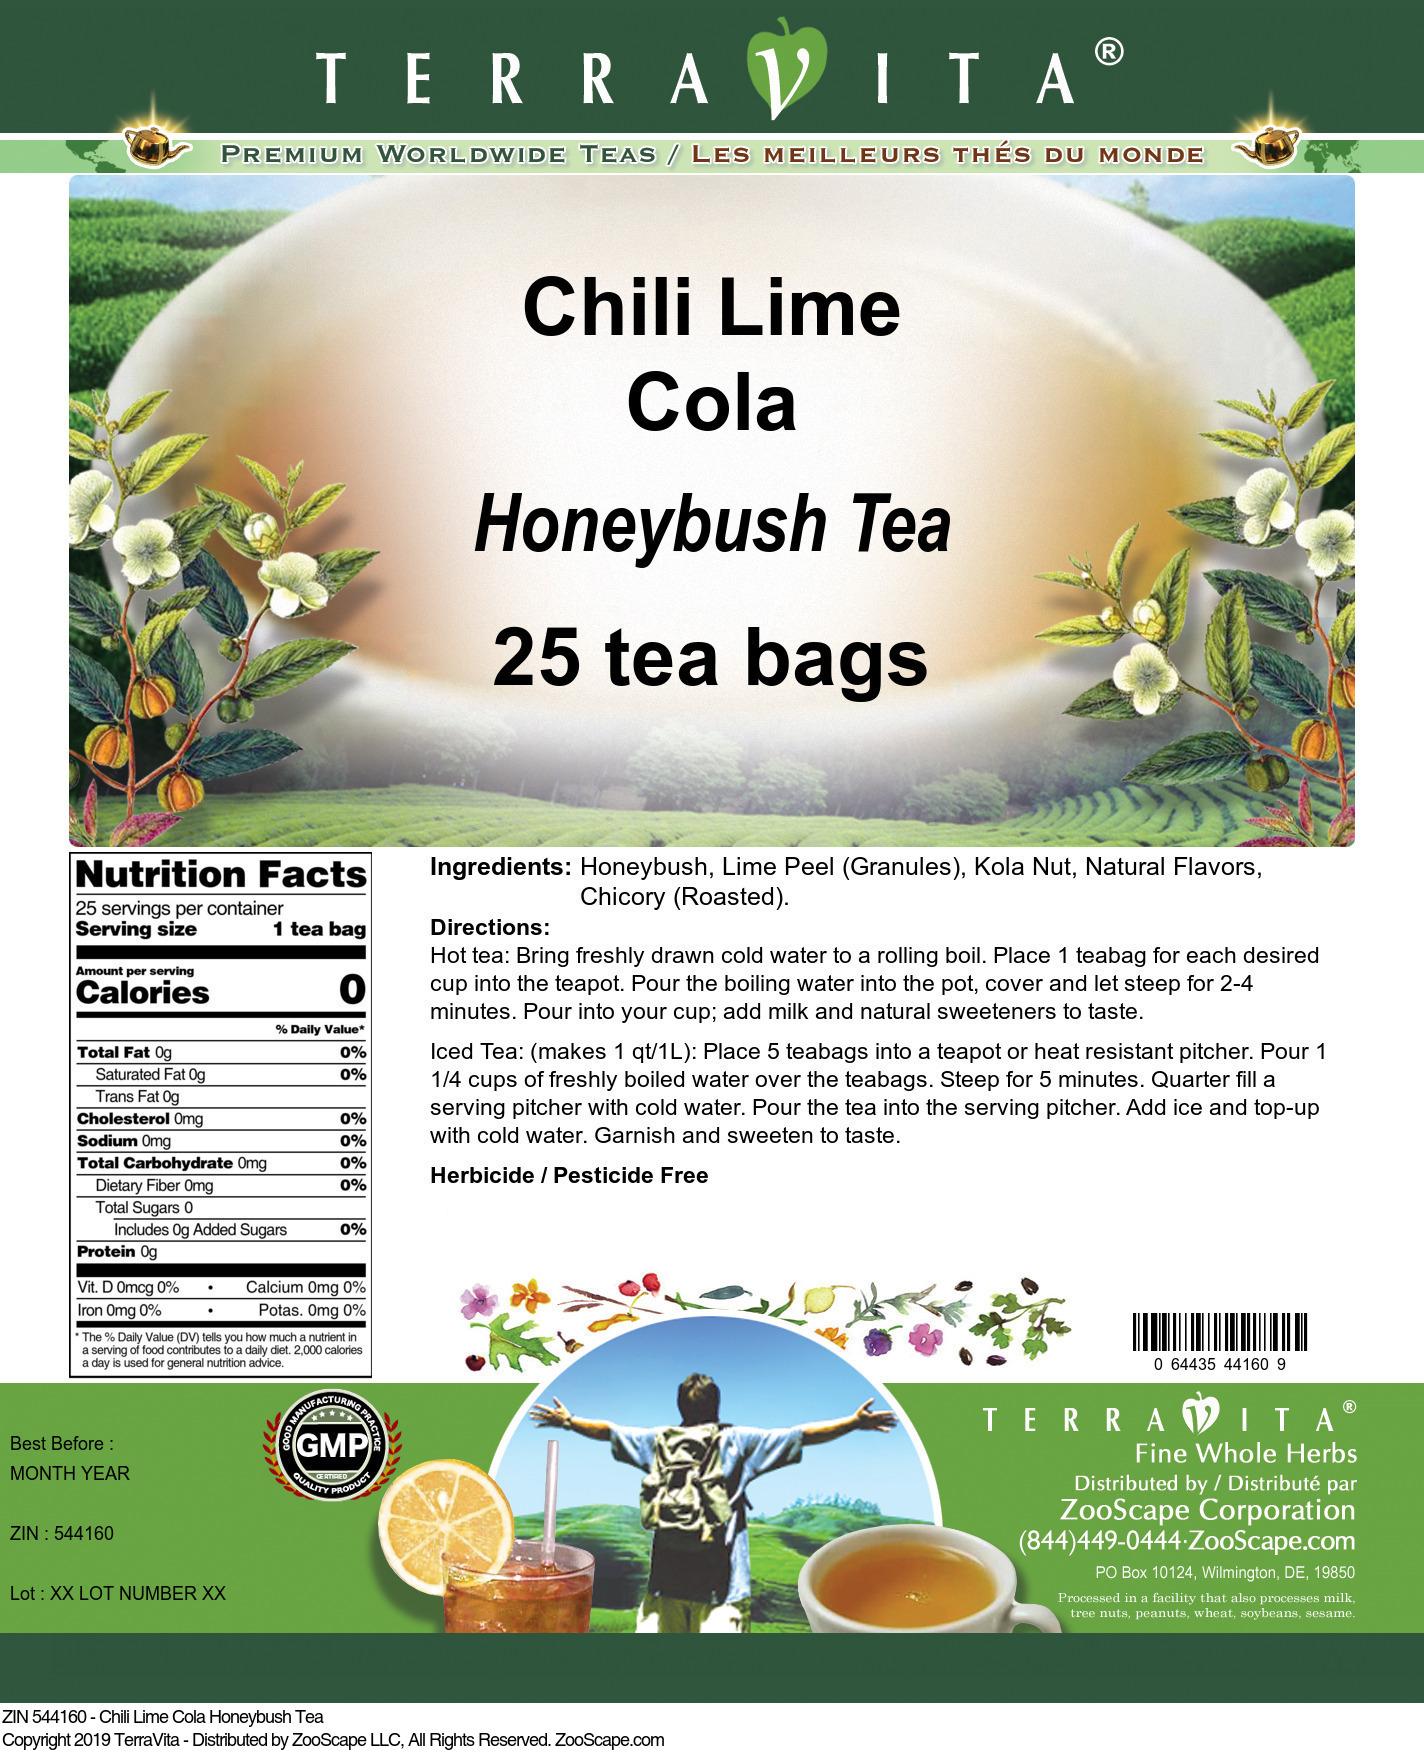 Chili Lime Cola Honeybush Tea